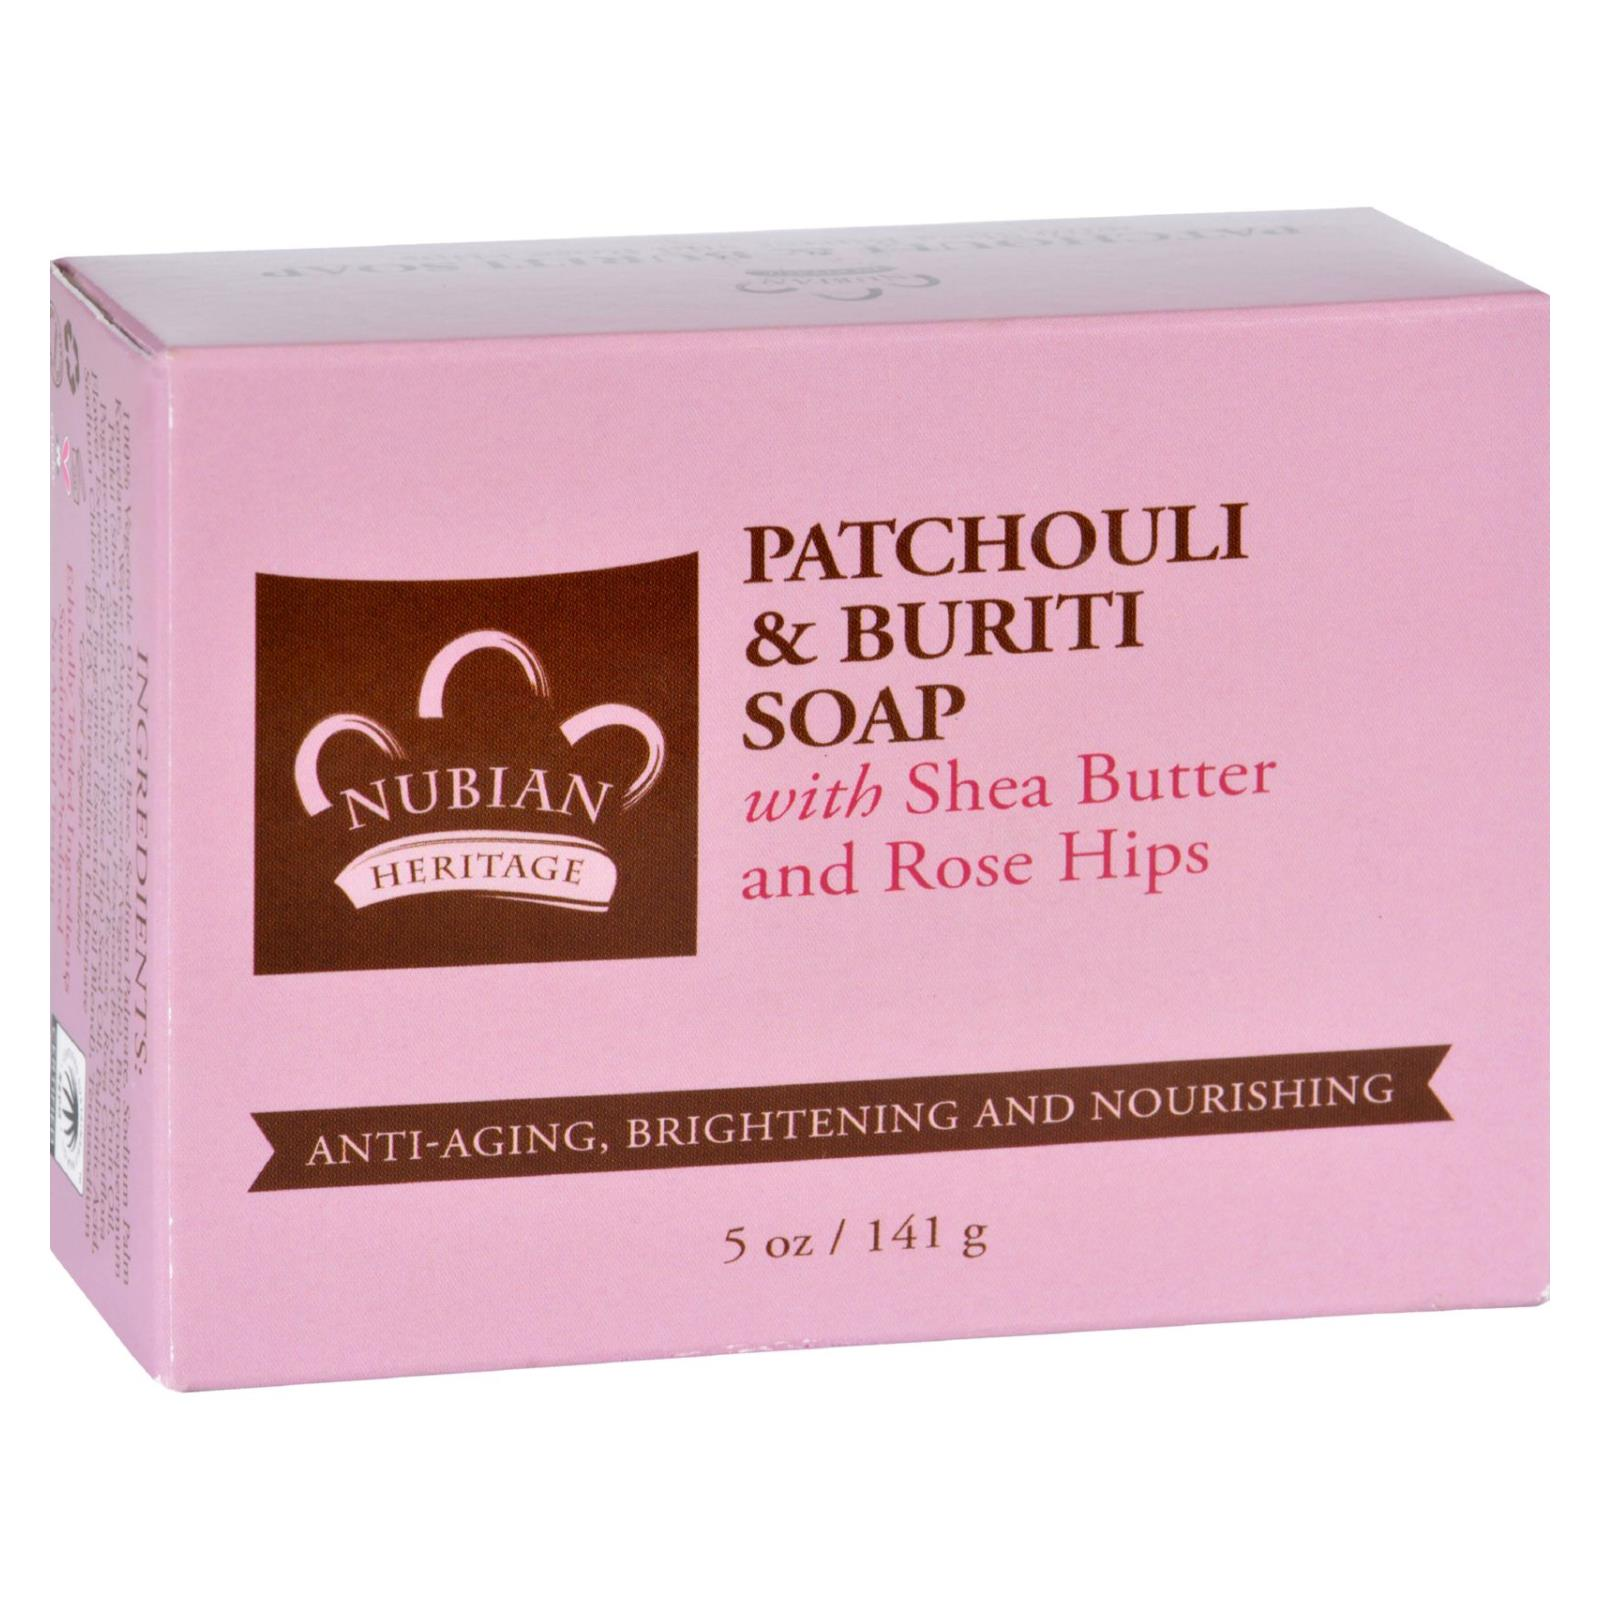 Nubian Heritage Bar Soap - Patchouli and Buriti - 5 oz